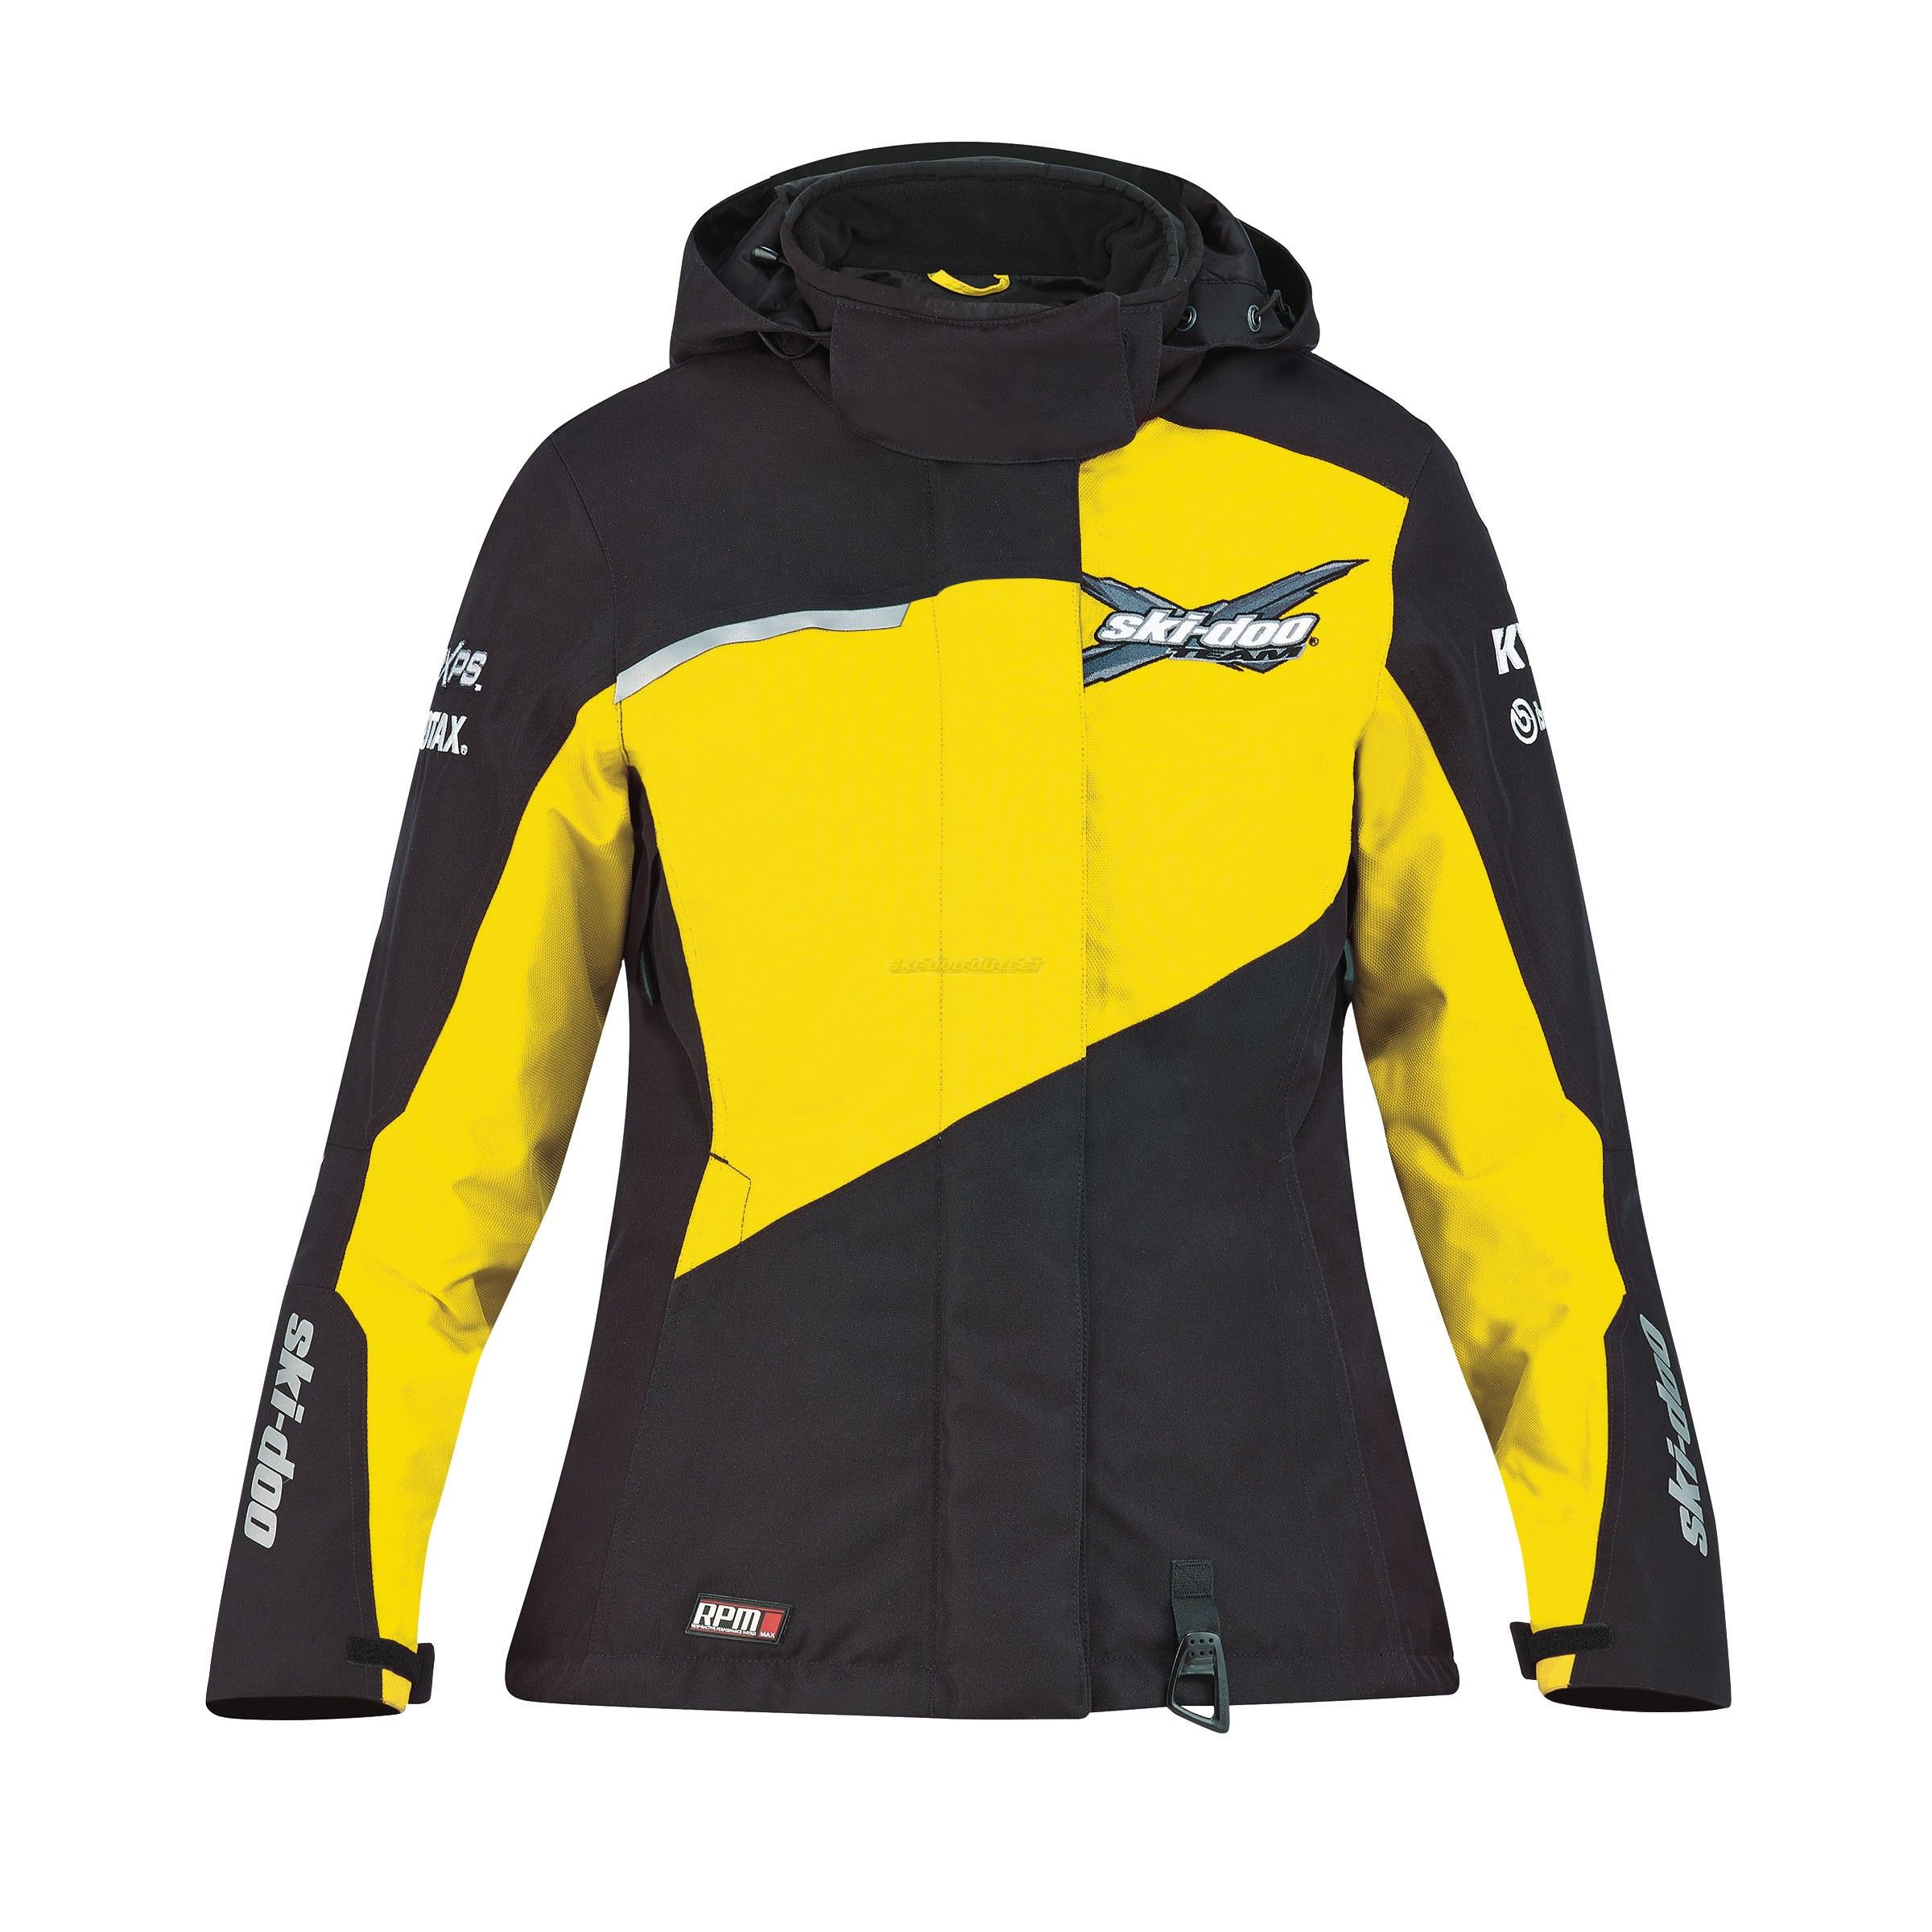 2018 Ladies Ski Doo X Team Jacket Sunburst Yellow Team Jackets Jackets Jackets For Women